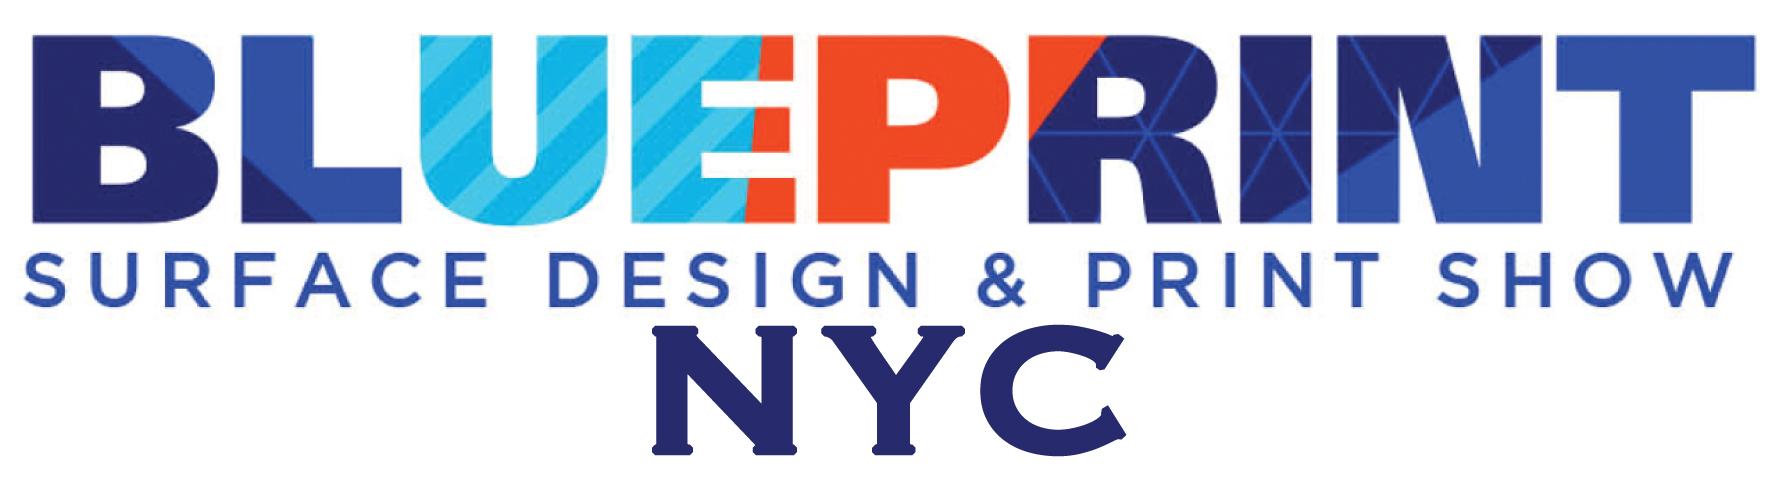 2018.05_blueprintNYC.jpg